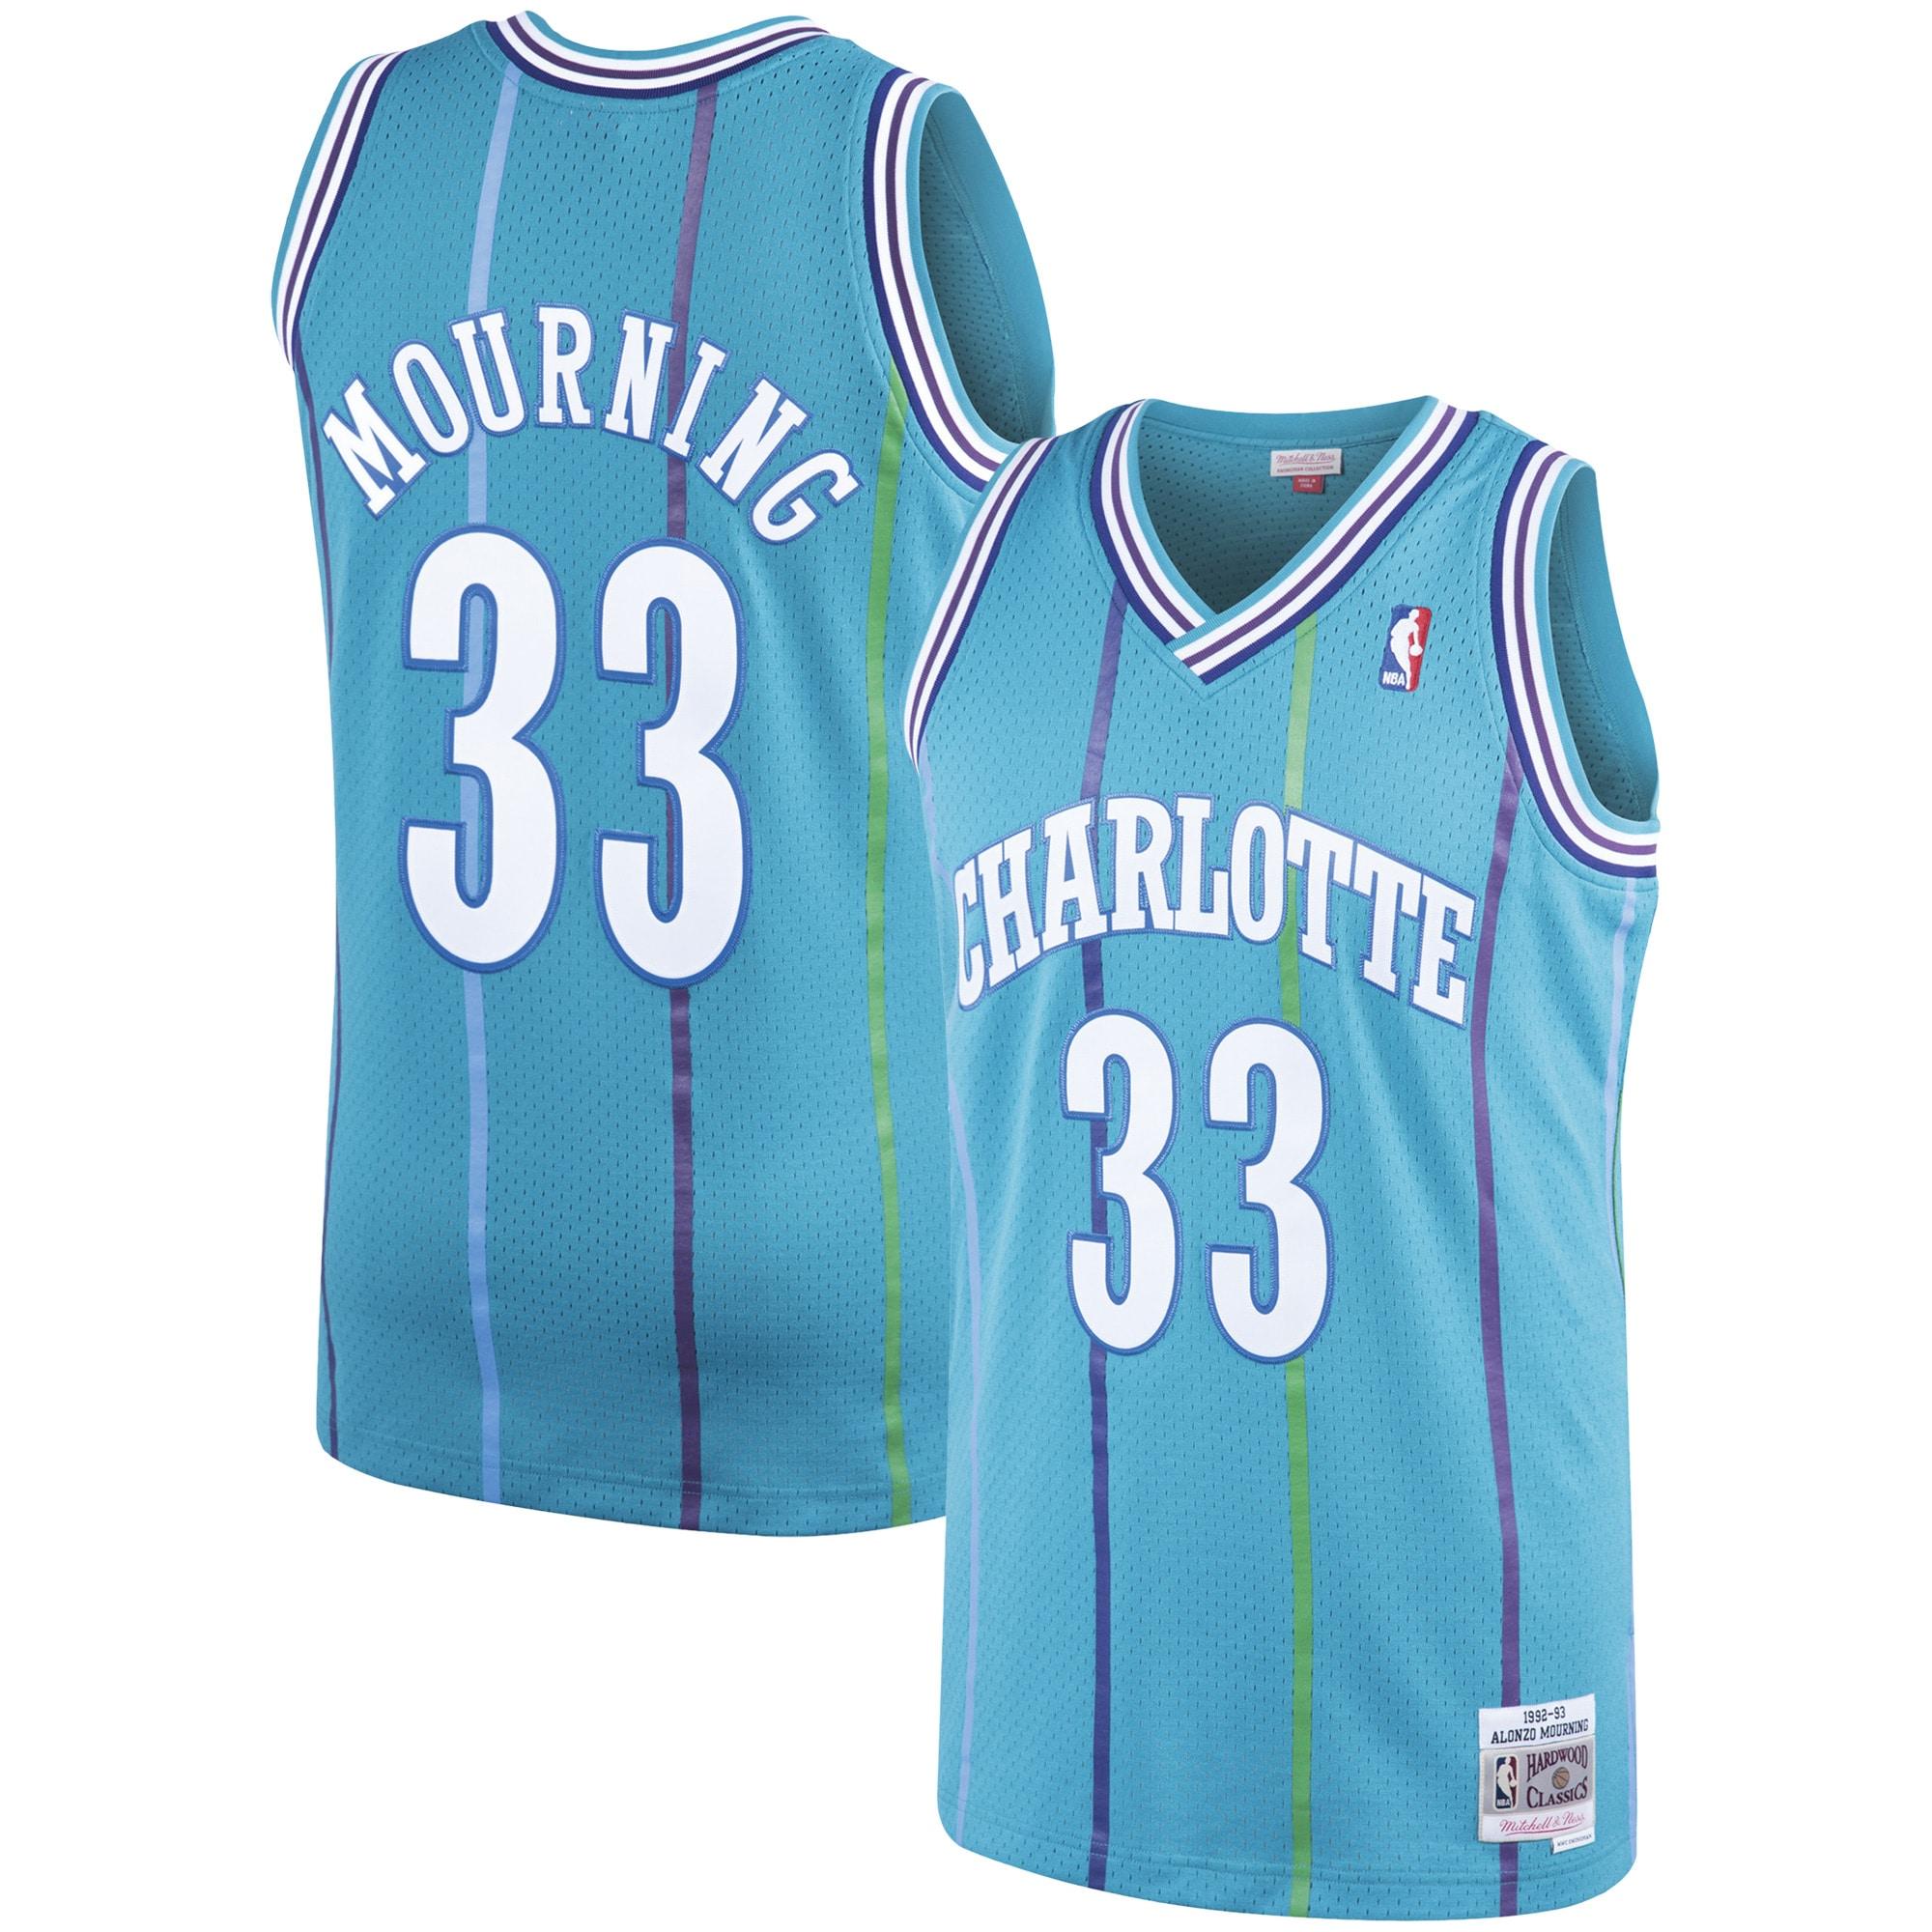 Alonzo Mourning Charlotte Hornets Mitchell & Ness 1992-93 Hardwood Classics Swingman Jersey - Teal